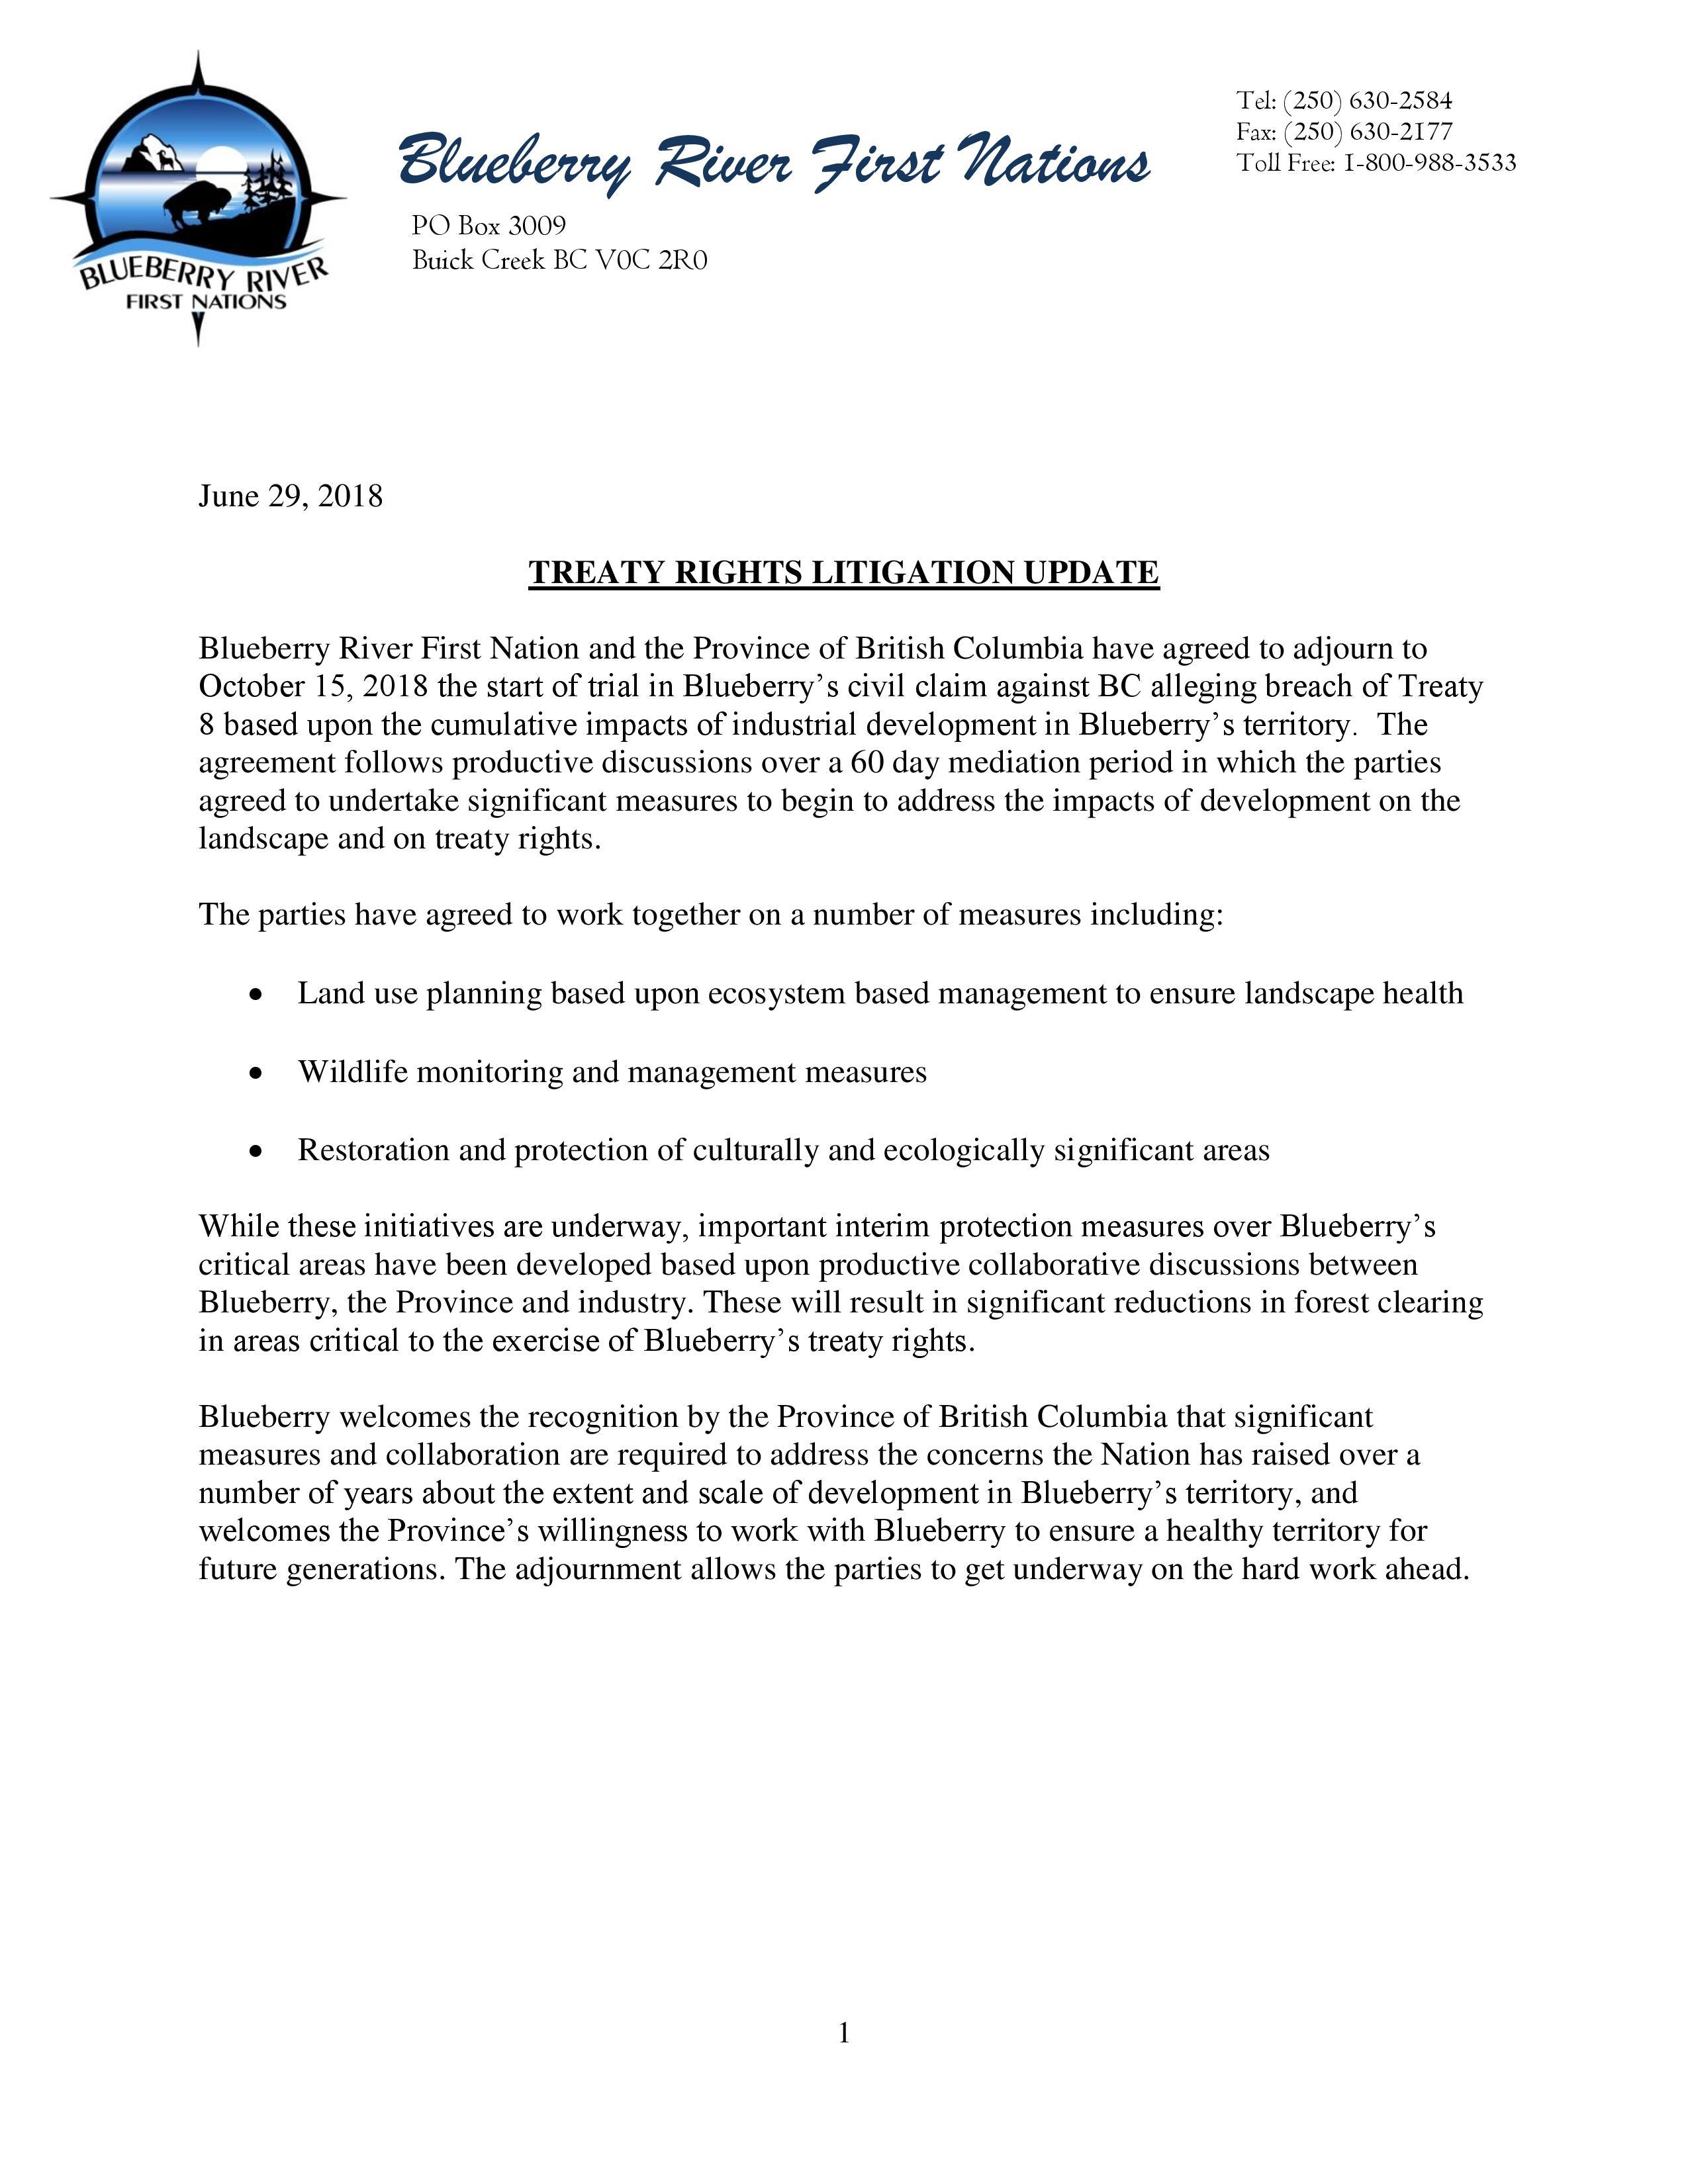 2018-06-28 Treaty Rights Litigation Update  Final-page-001.jpg